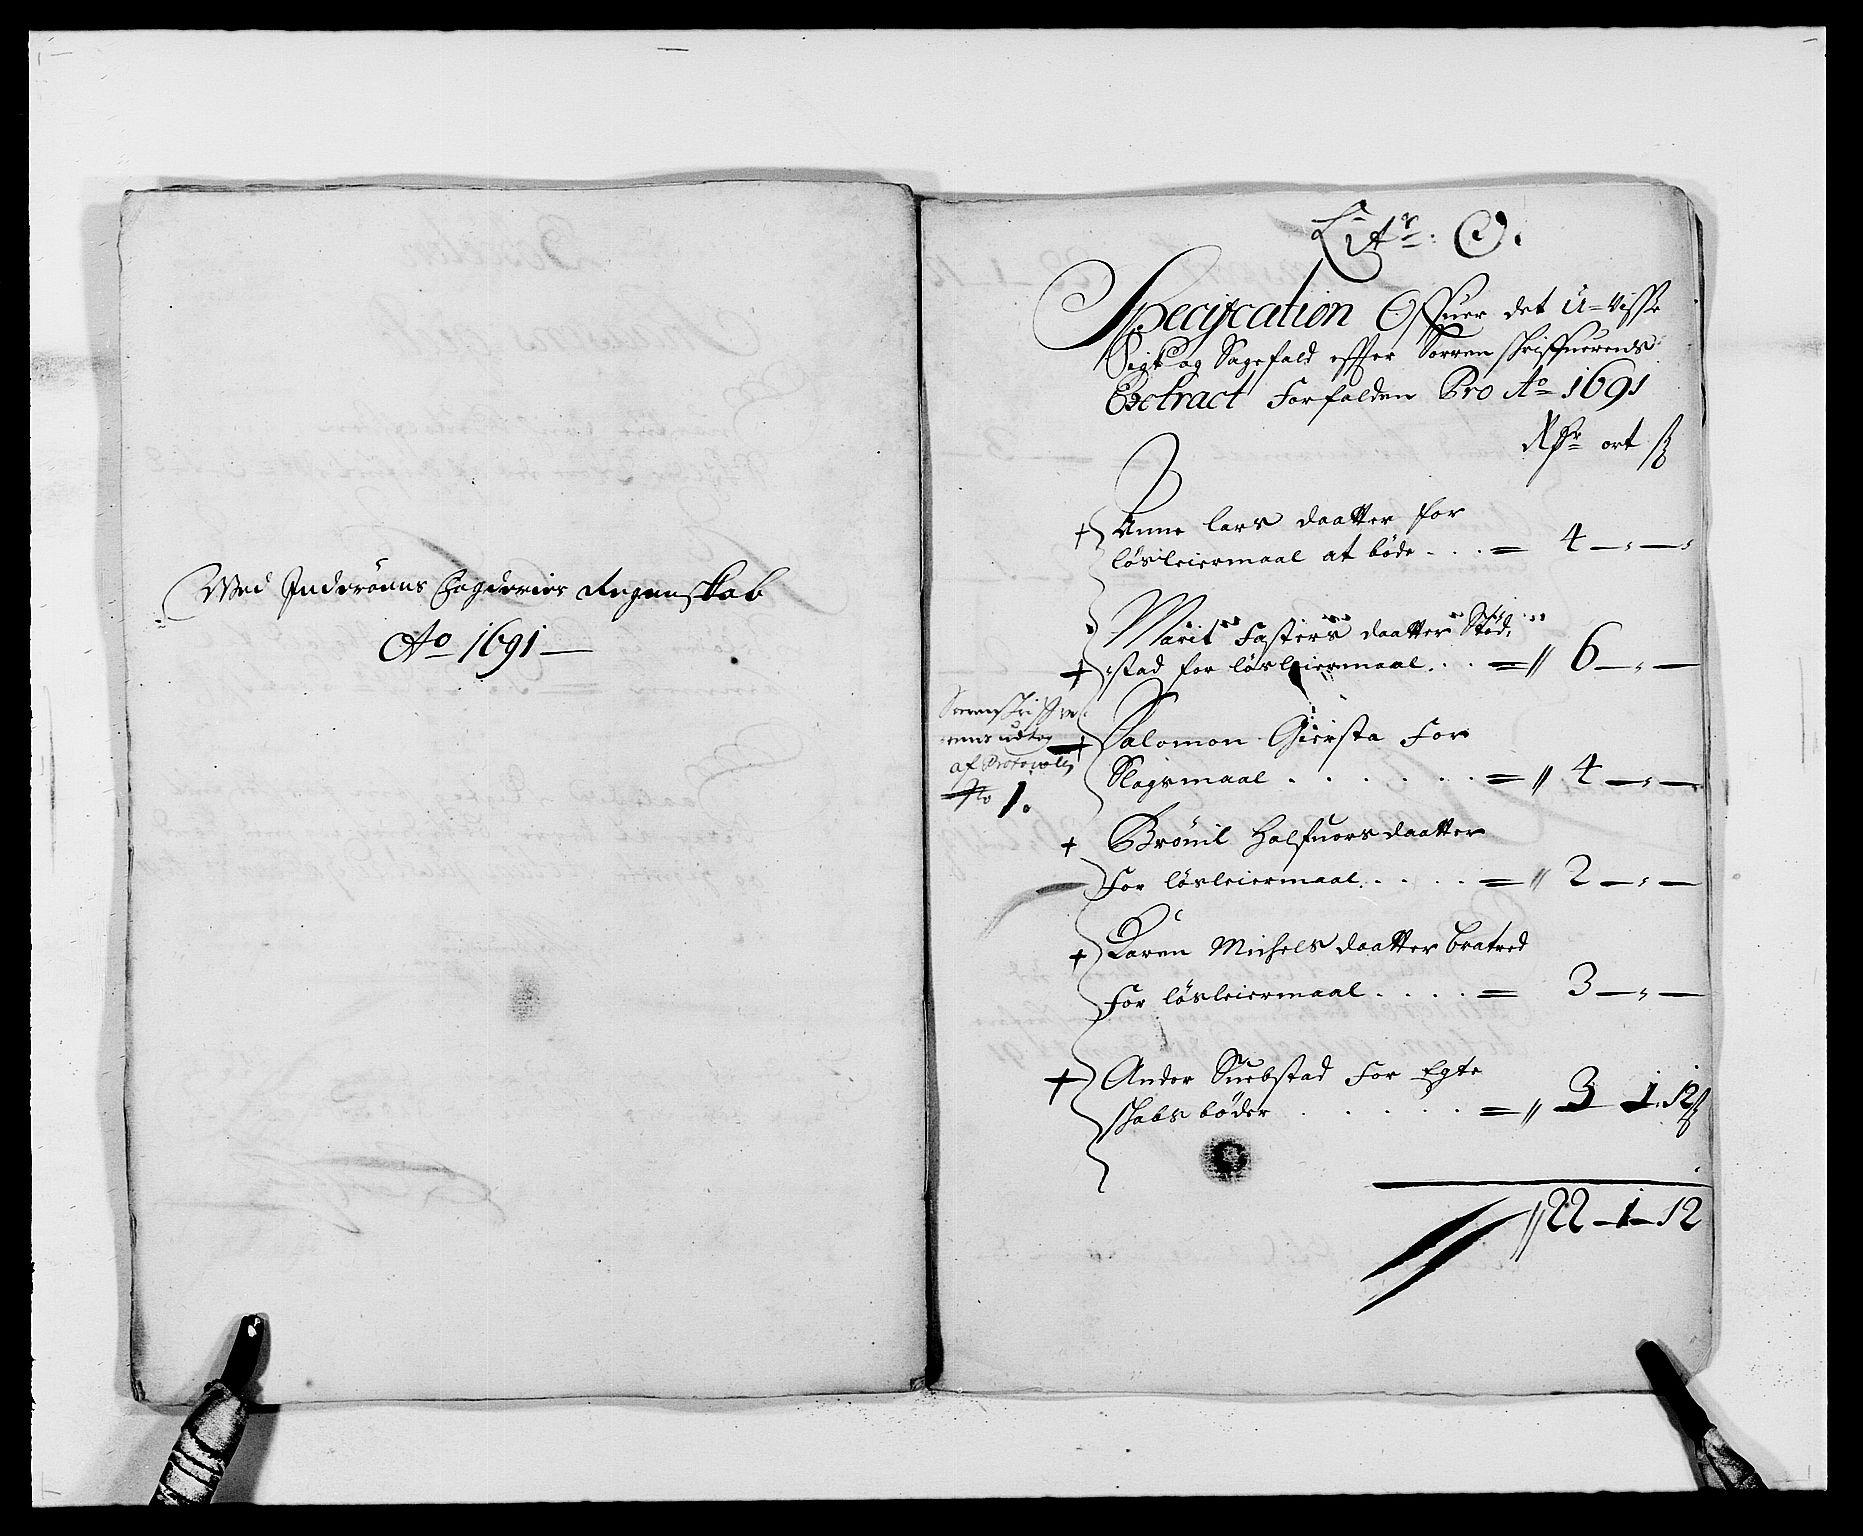 RA, Rentekammeret inntil 1814, Reviderte regnskaper, Fogderegnskap, R63/L4307: Fogderegnskap Inderøy, 1690-1691, s. 402